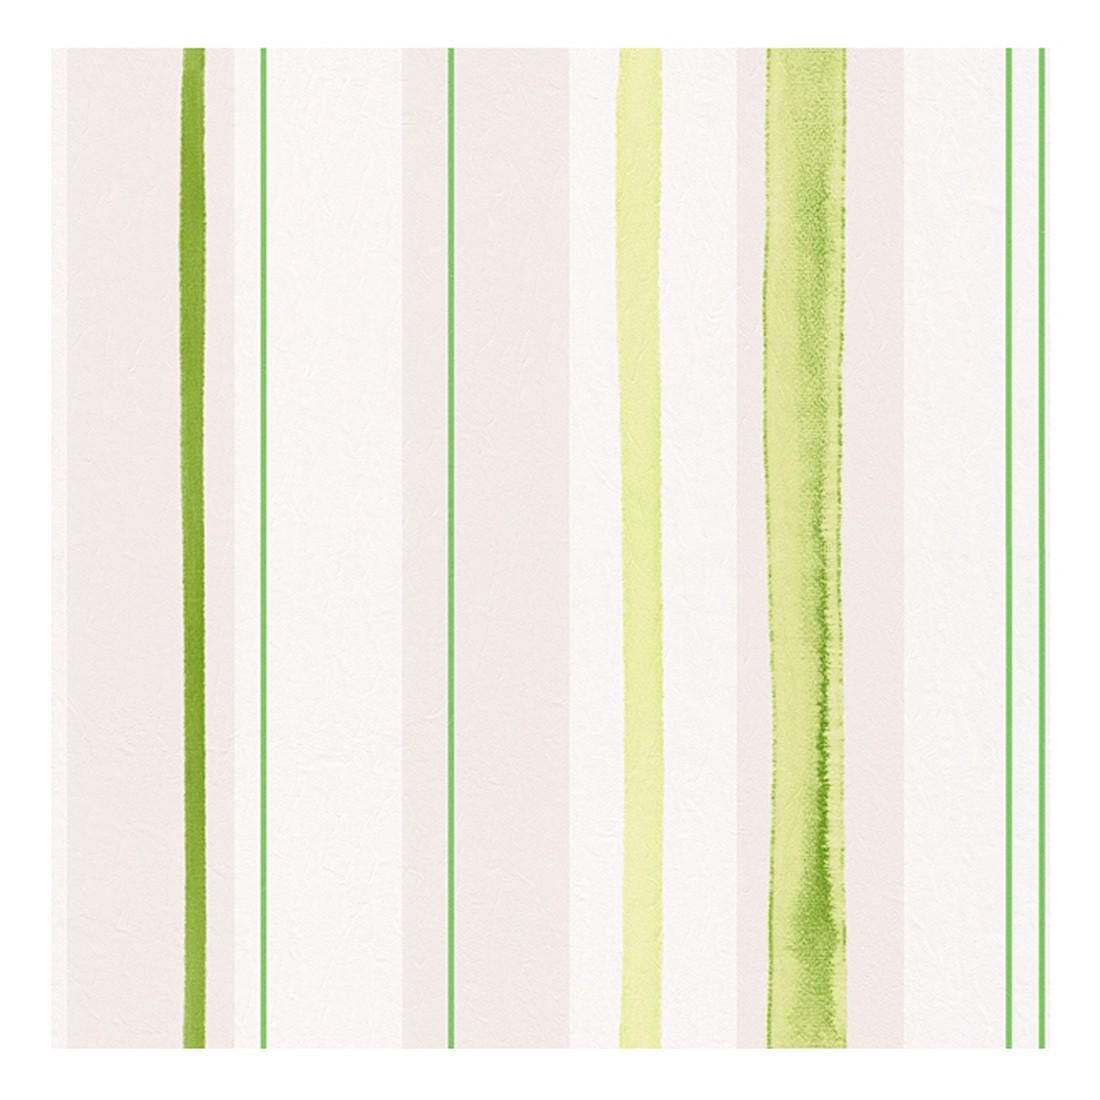 Papiertapete Aquarelle – weiß, grün, perlweiß, glänzend – glatt, Home24Deko bestellen